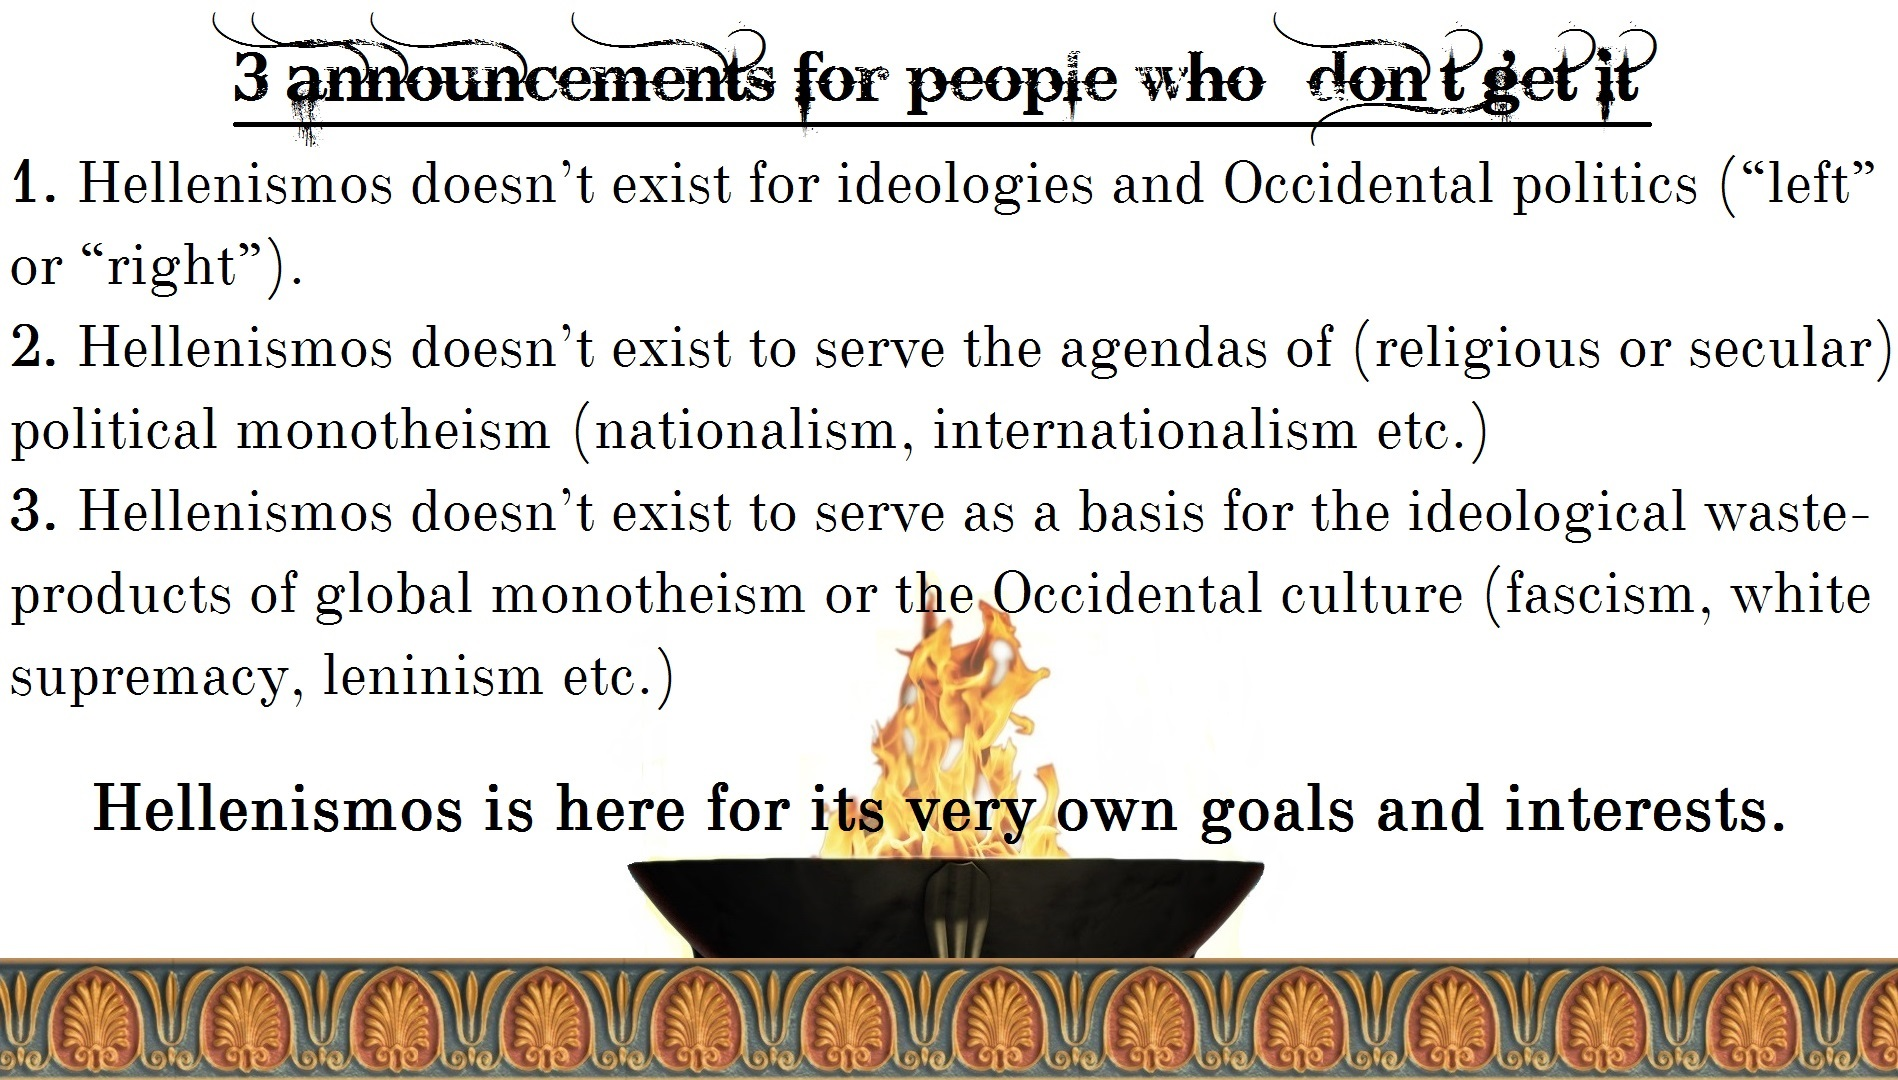 Hellenismos politics ideologies